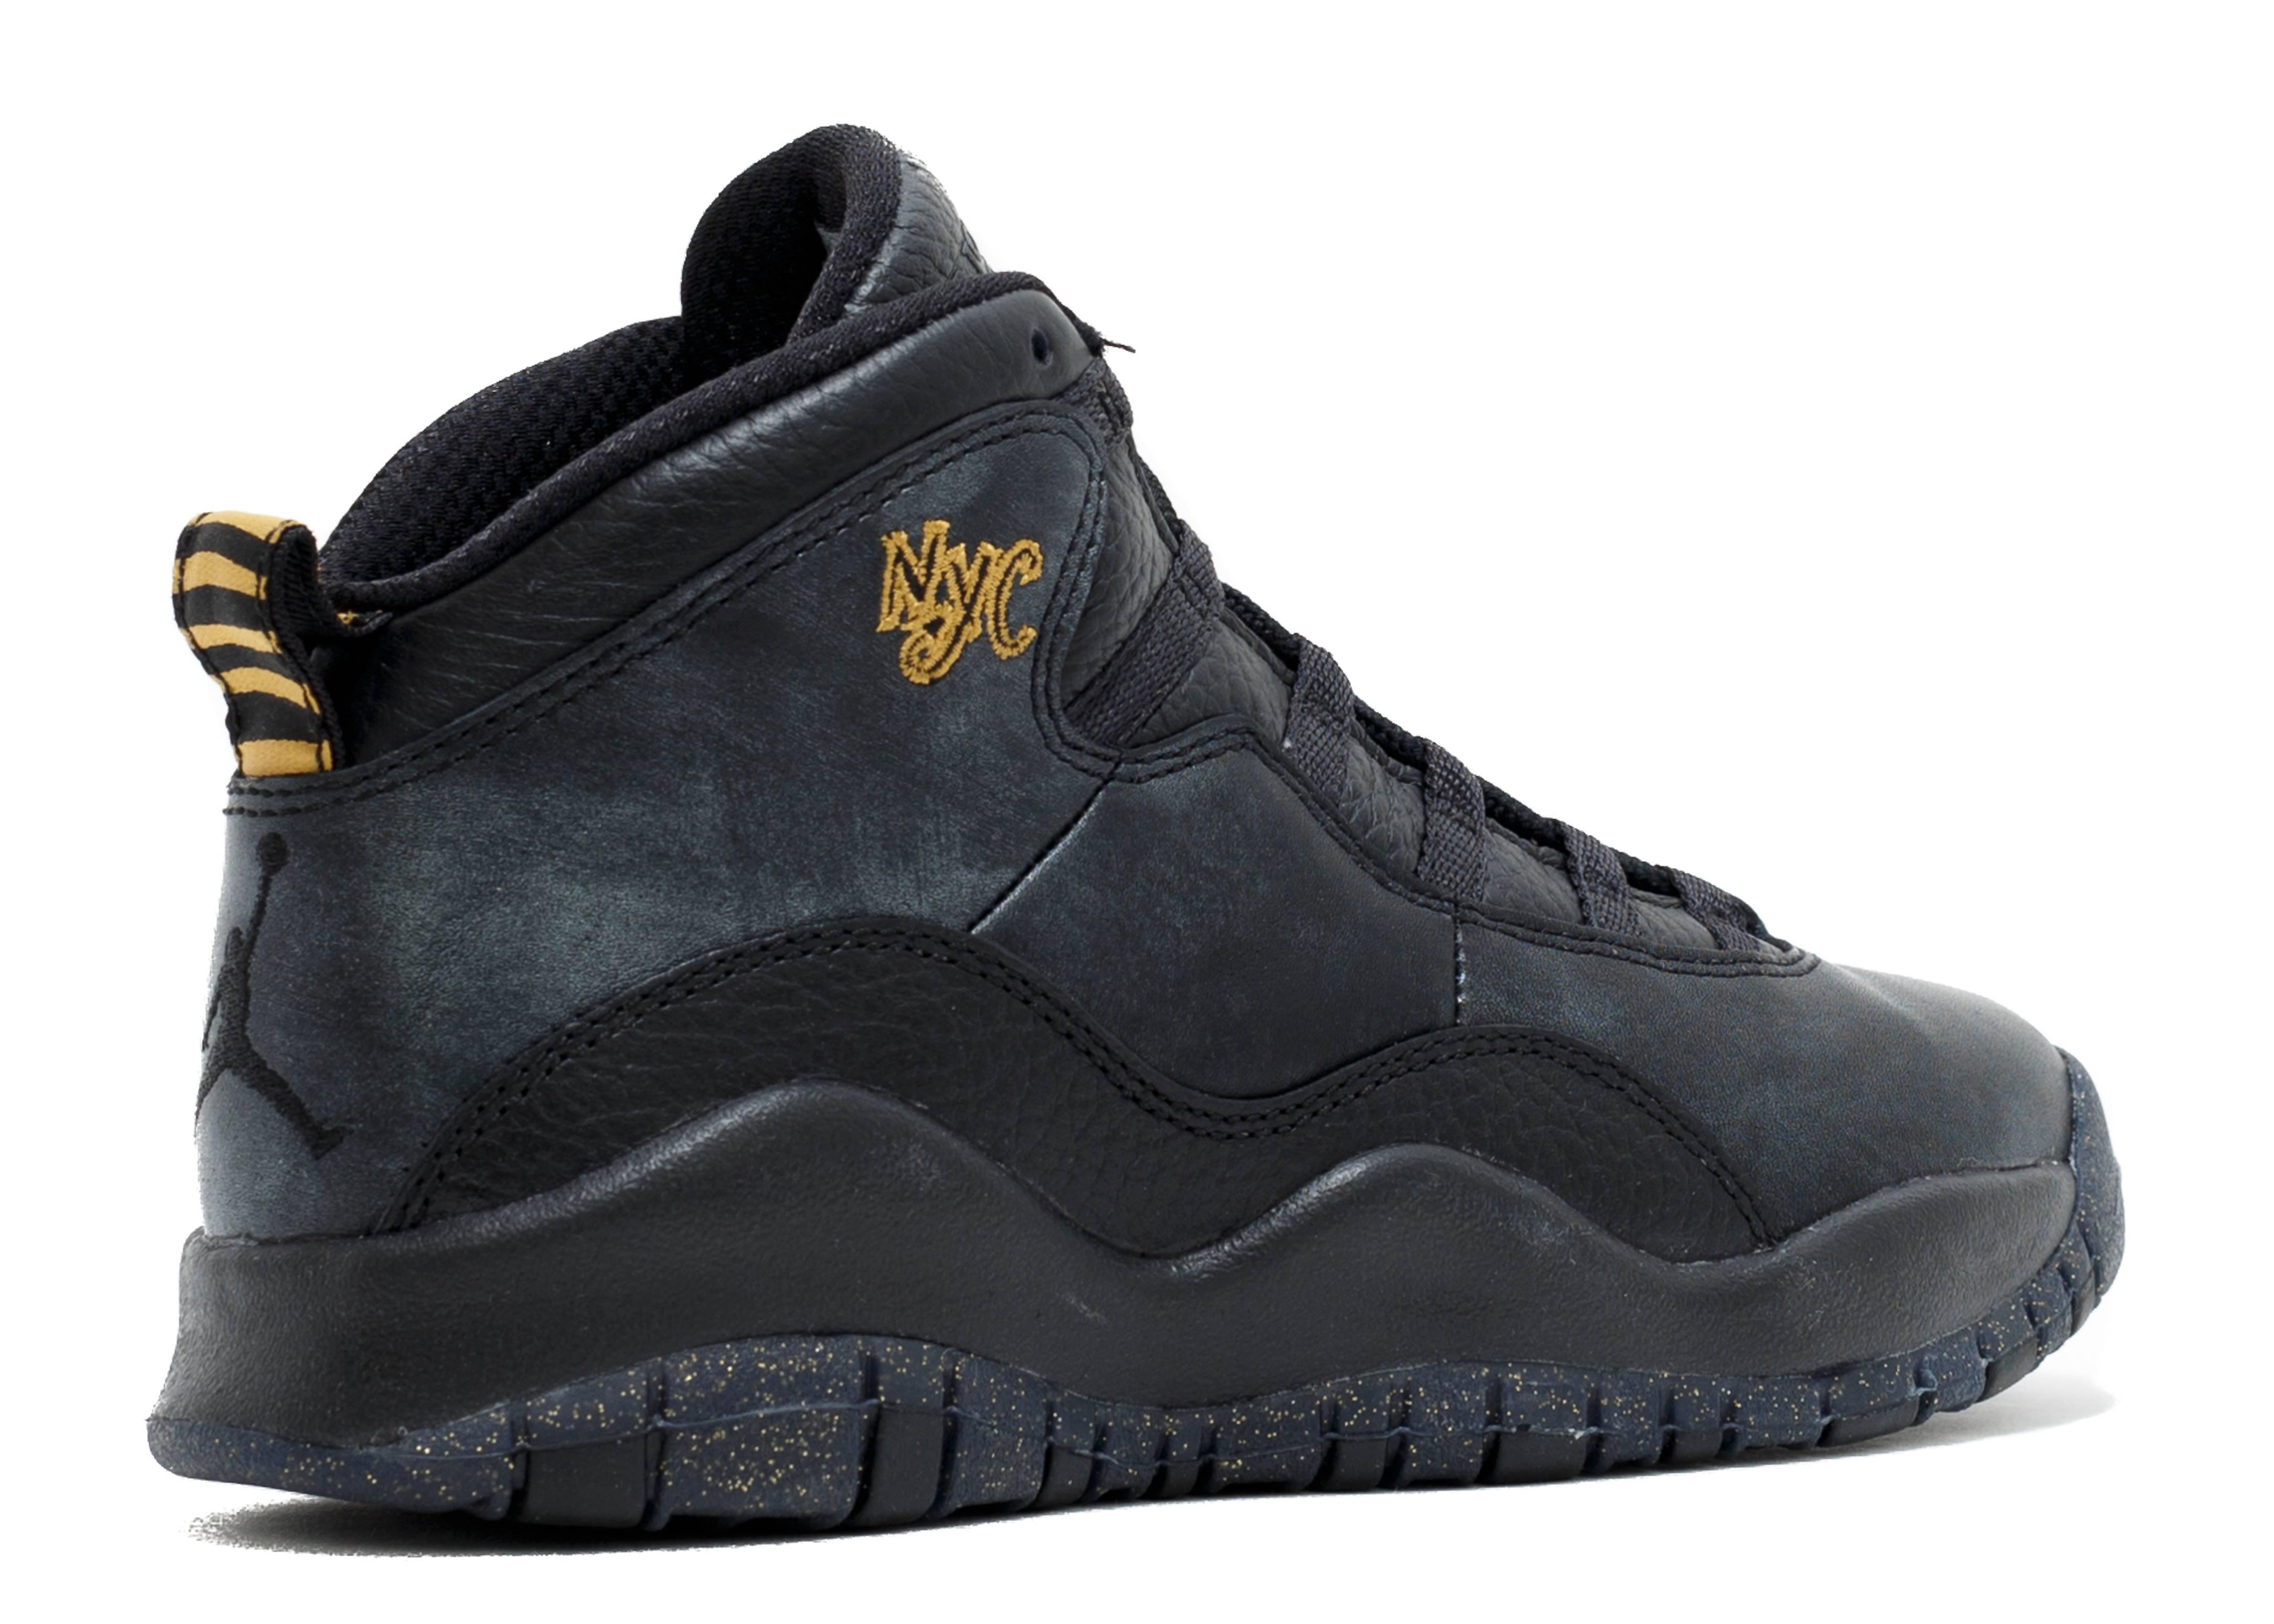 air jordan retro 10 black grey